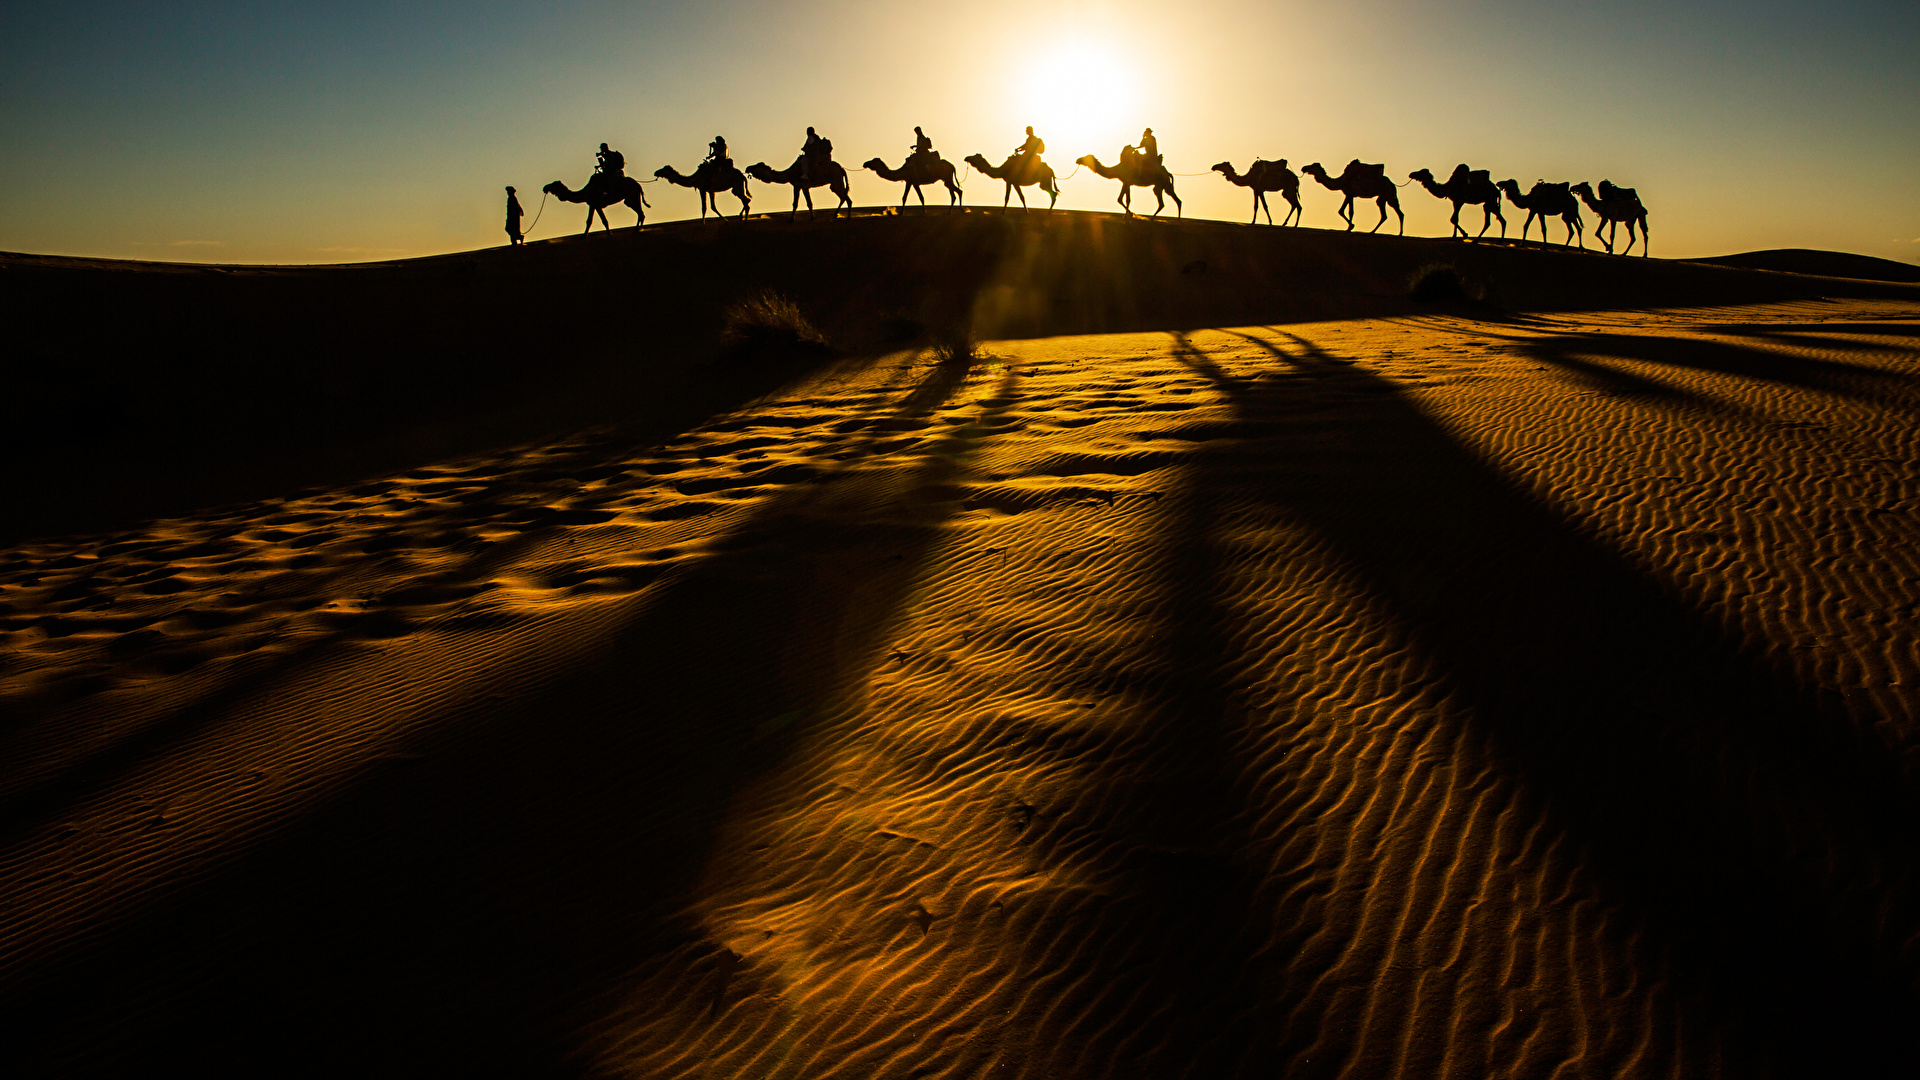 Картинка Верблюды Силуэт Природа Пустыни Песок 1920x1080 силуэты силуэта песке песка